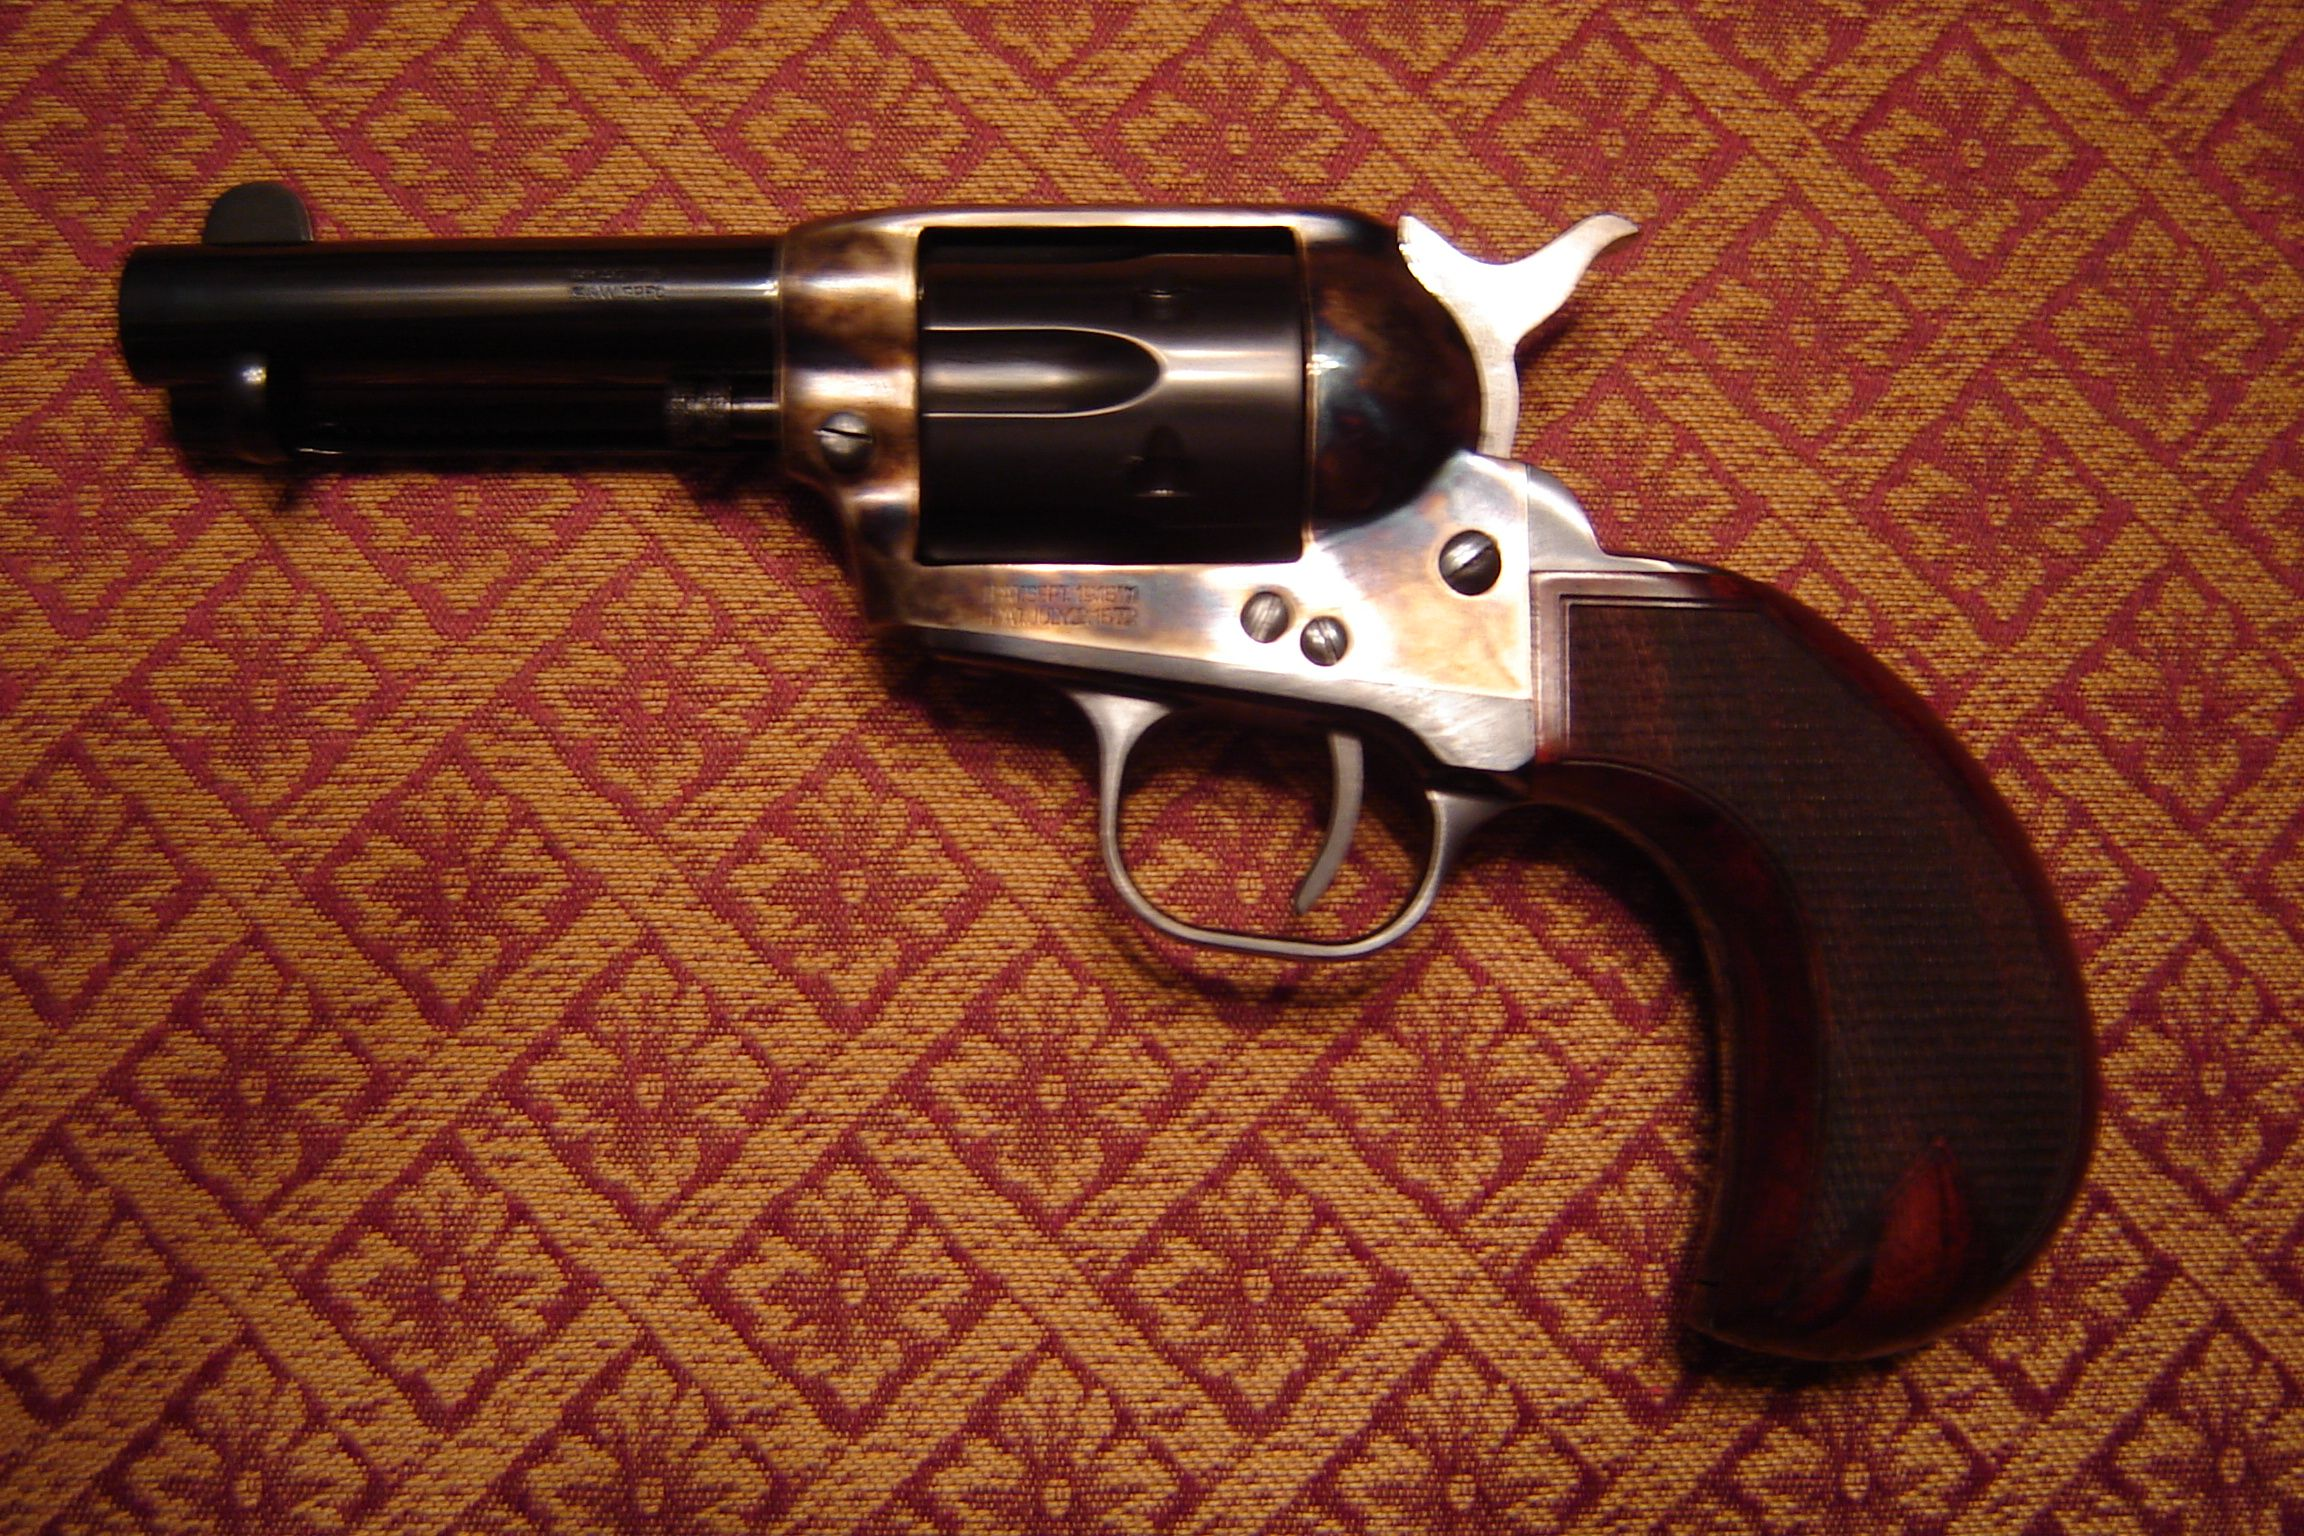 Double pistol handgun revolver gun display case cabinet rack shadowbox - Uberti Birdshead 38 Spl Handgunrevolverstactical Firearms Beautifulwaraccessoriesweaponsguns